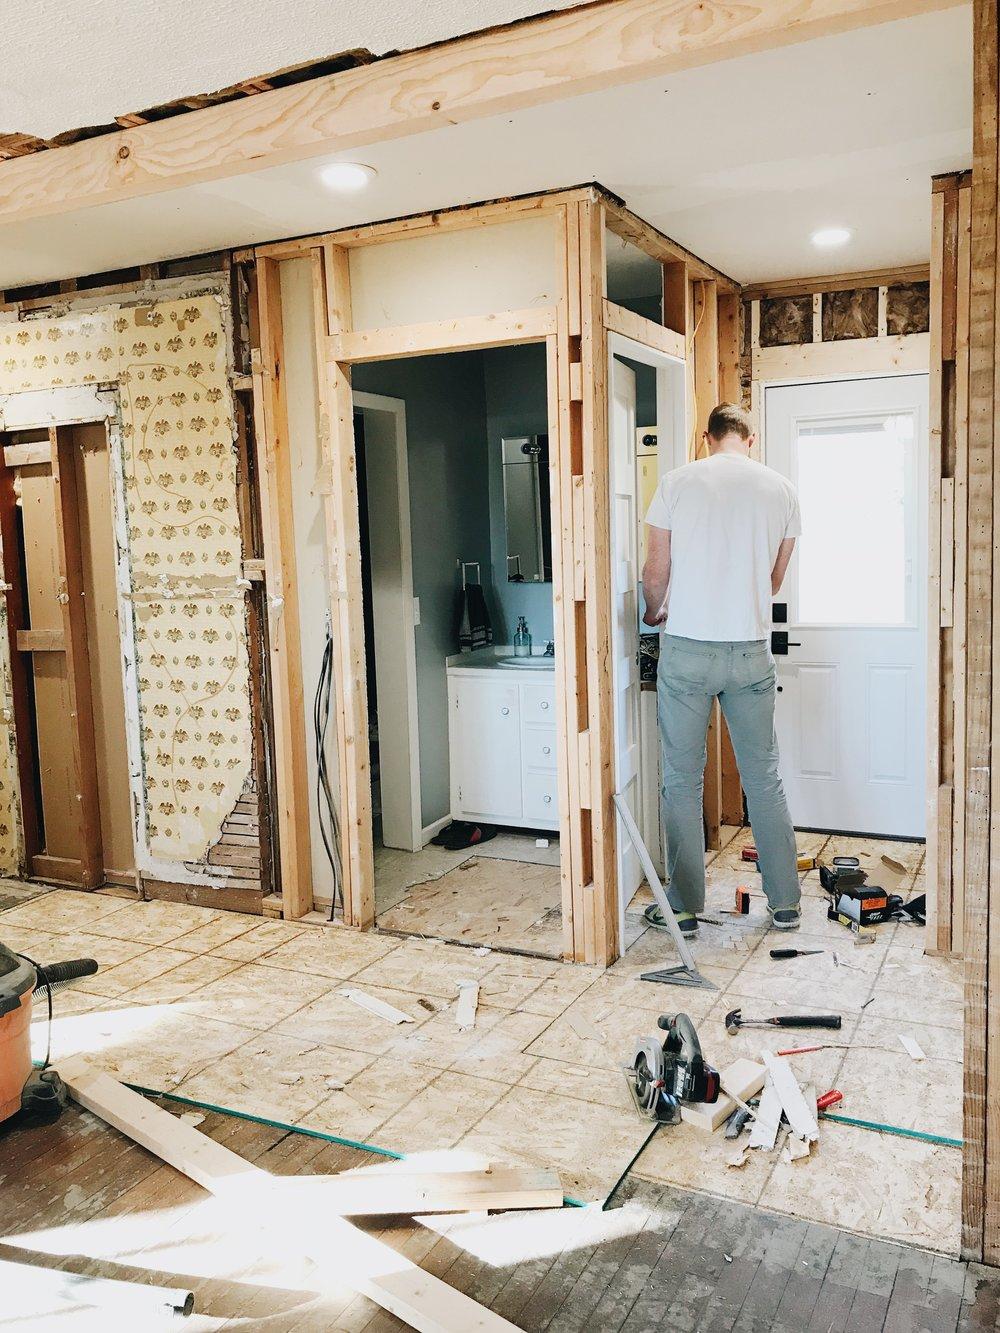 Our first flip house - demo has begun